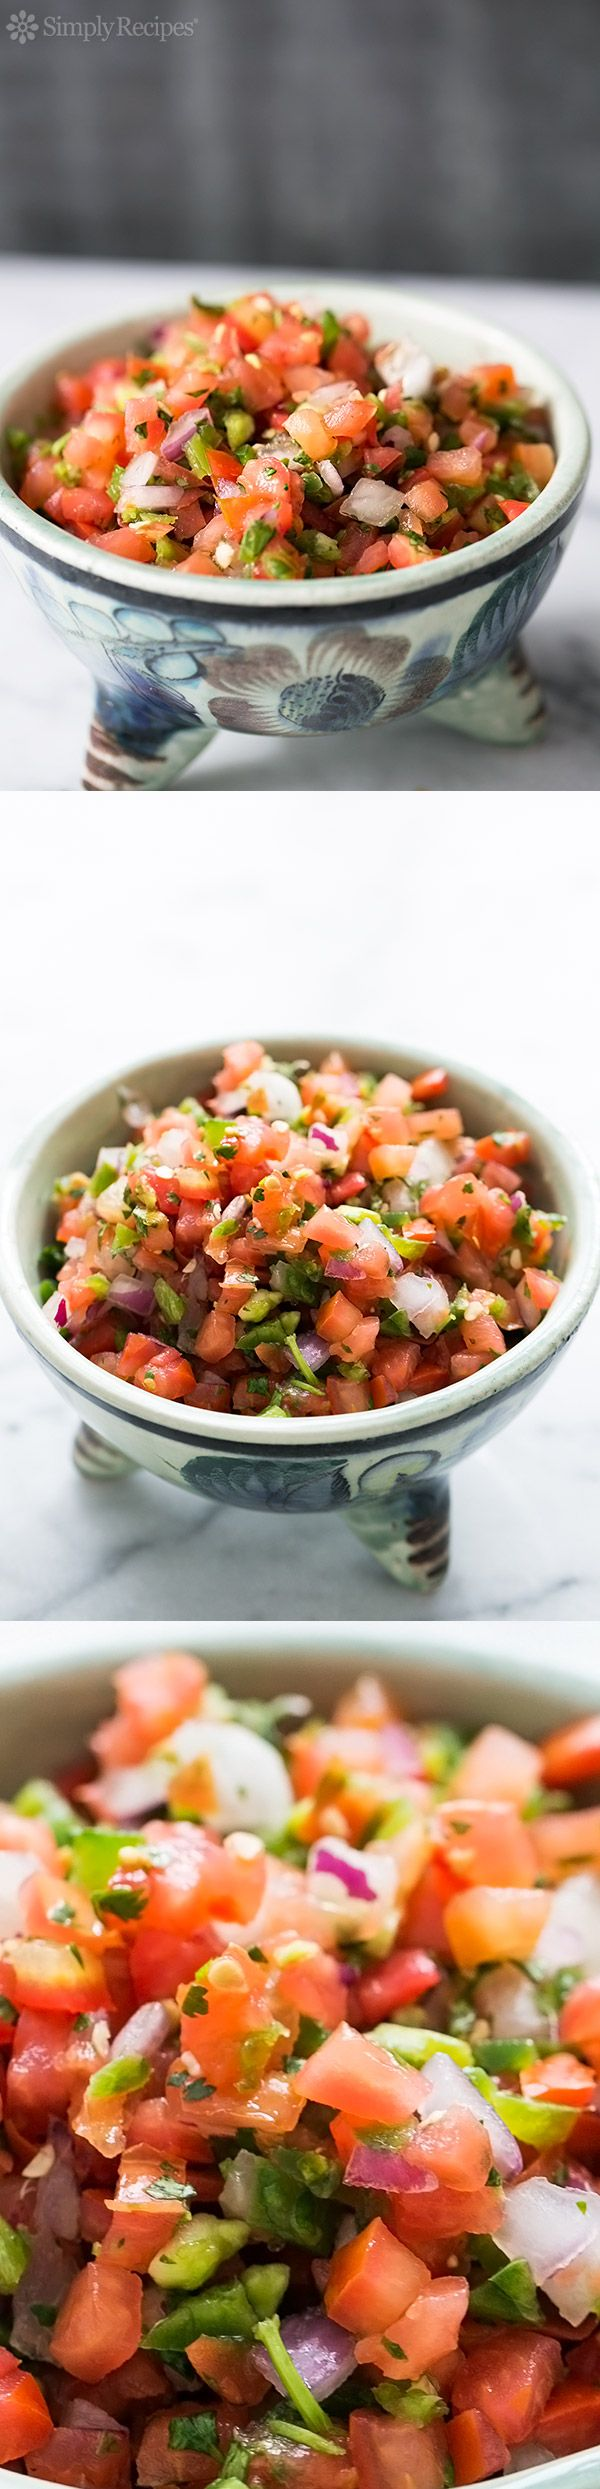 Fresh Tomato Salsa ~ Mexican salsa recipe made with chopped fresh tomatoes, jalapeno or serano chiles, red onion, cilantro, and lime. Also called Pico de Gallo or Salsa Fresca. ~ SimplyRecipes.com